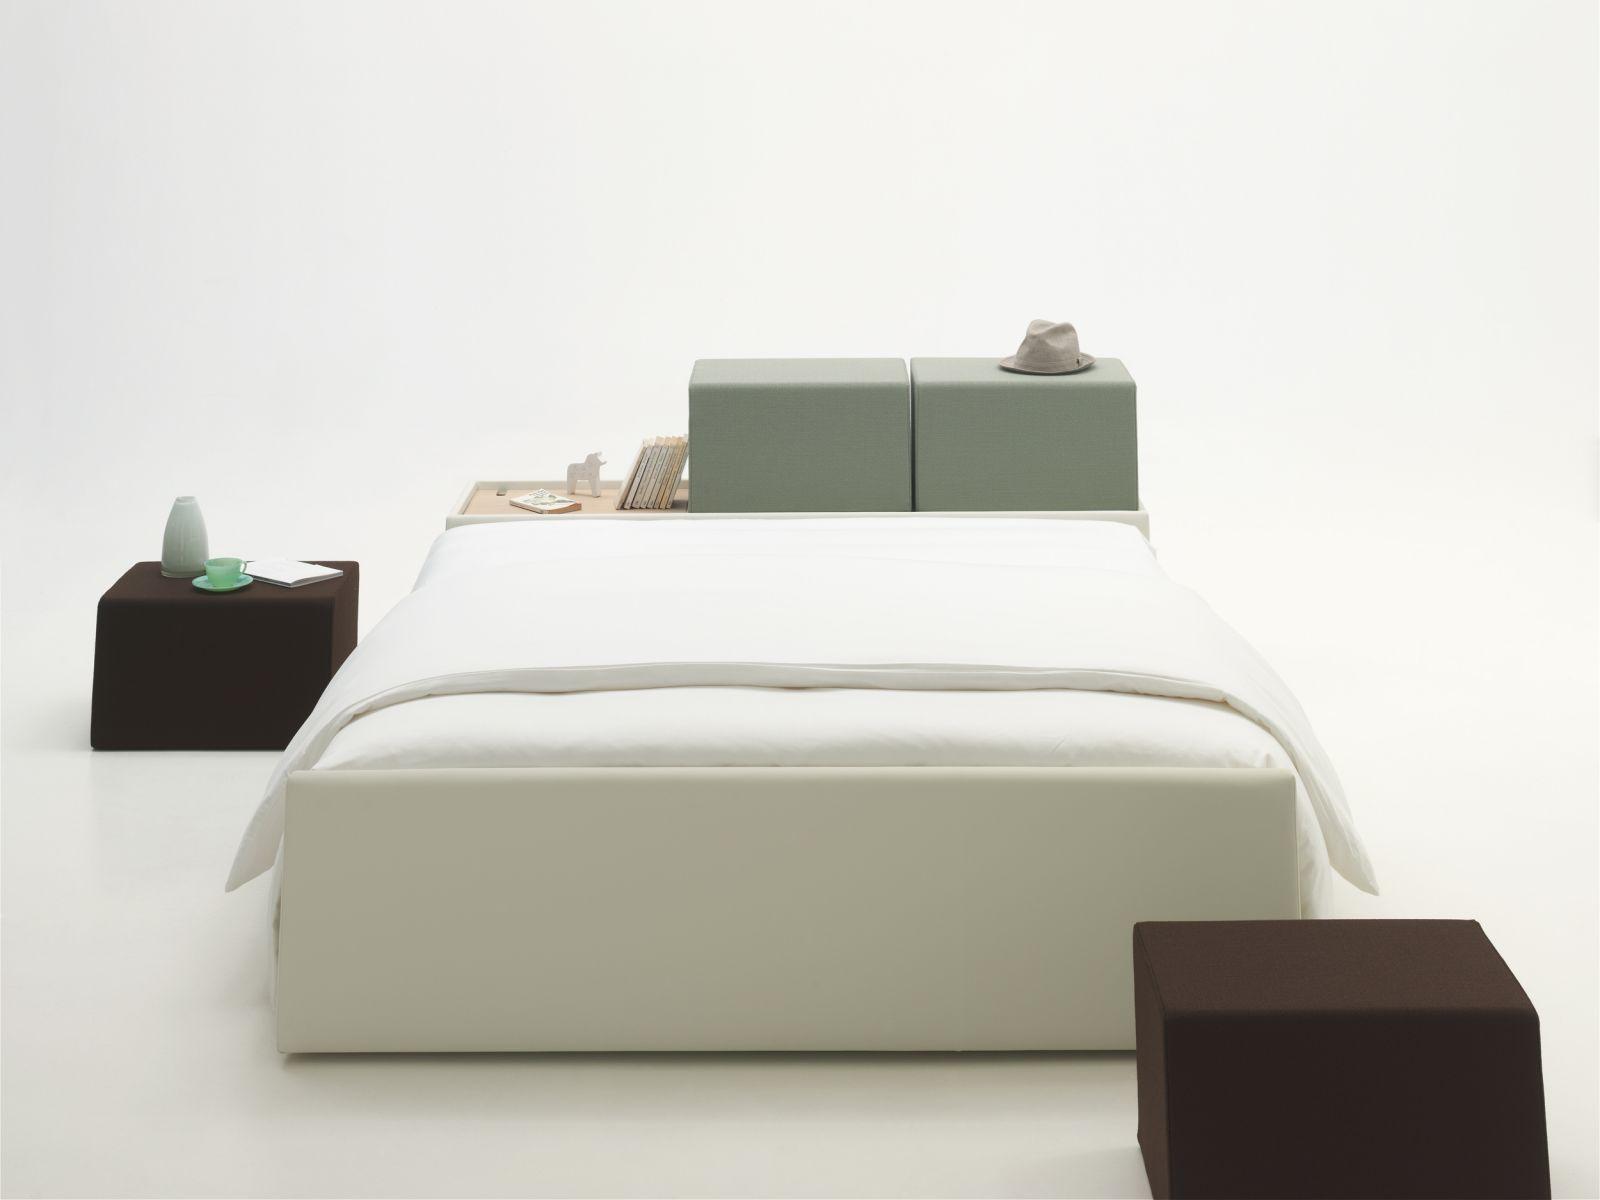 Alexandre Bed Design By Jean Fran Ois D Or For Magnitude Modular  # Muebles Modulares Lukar